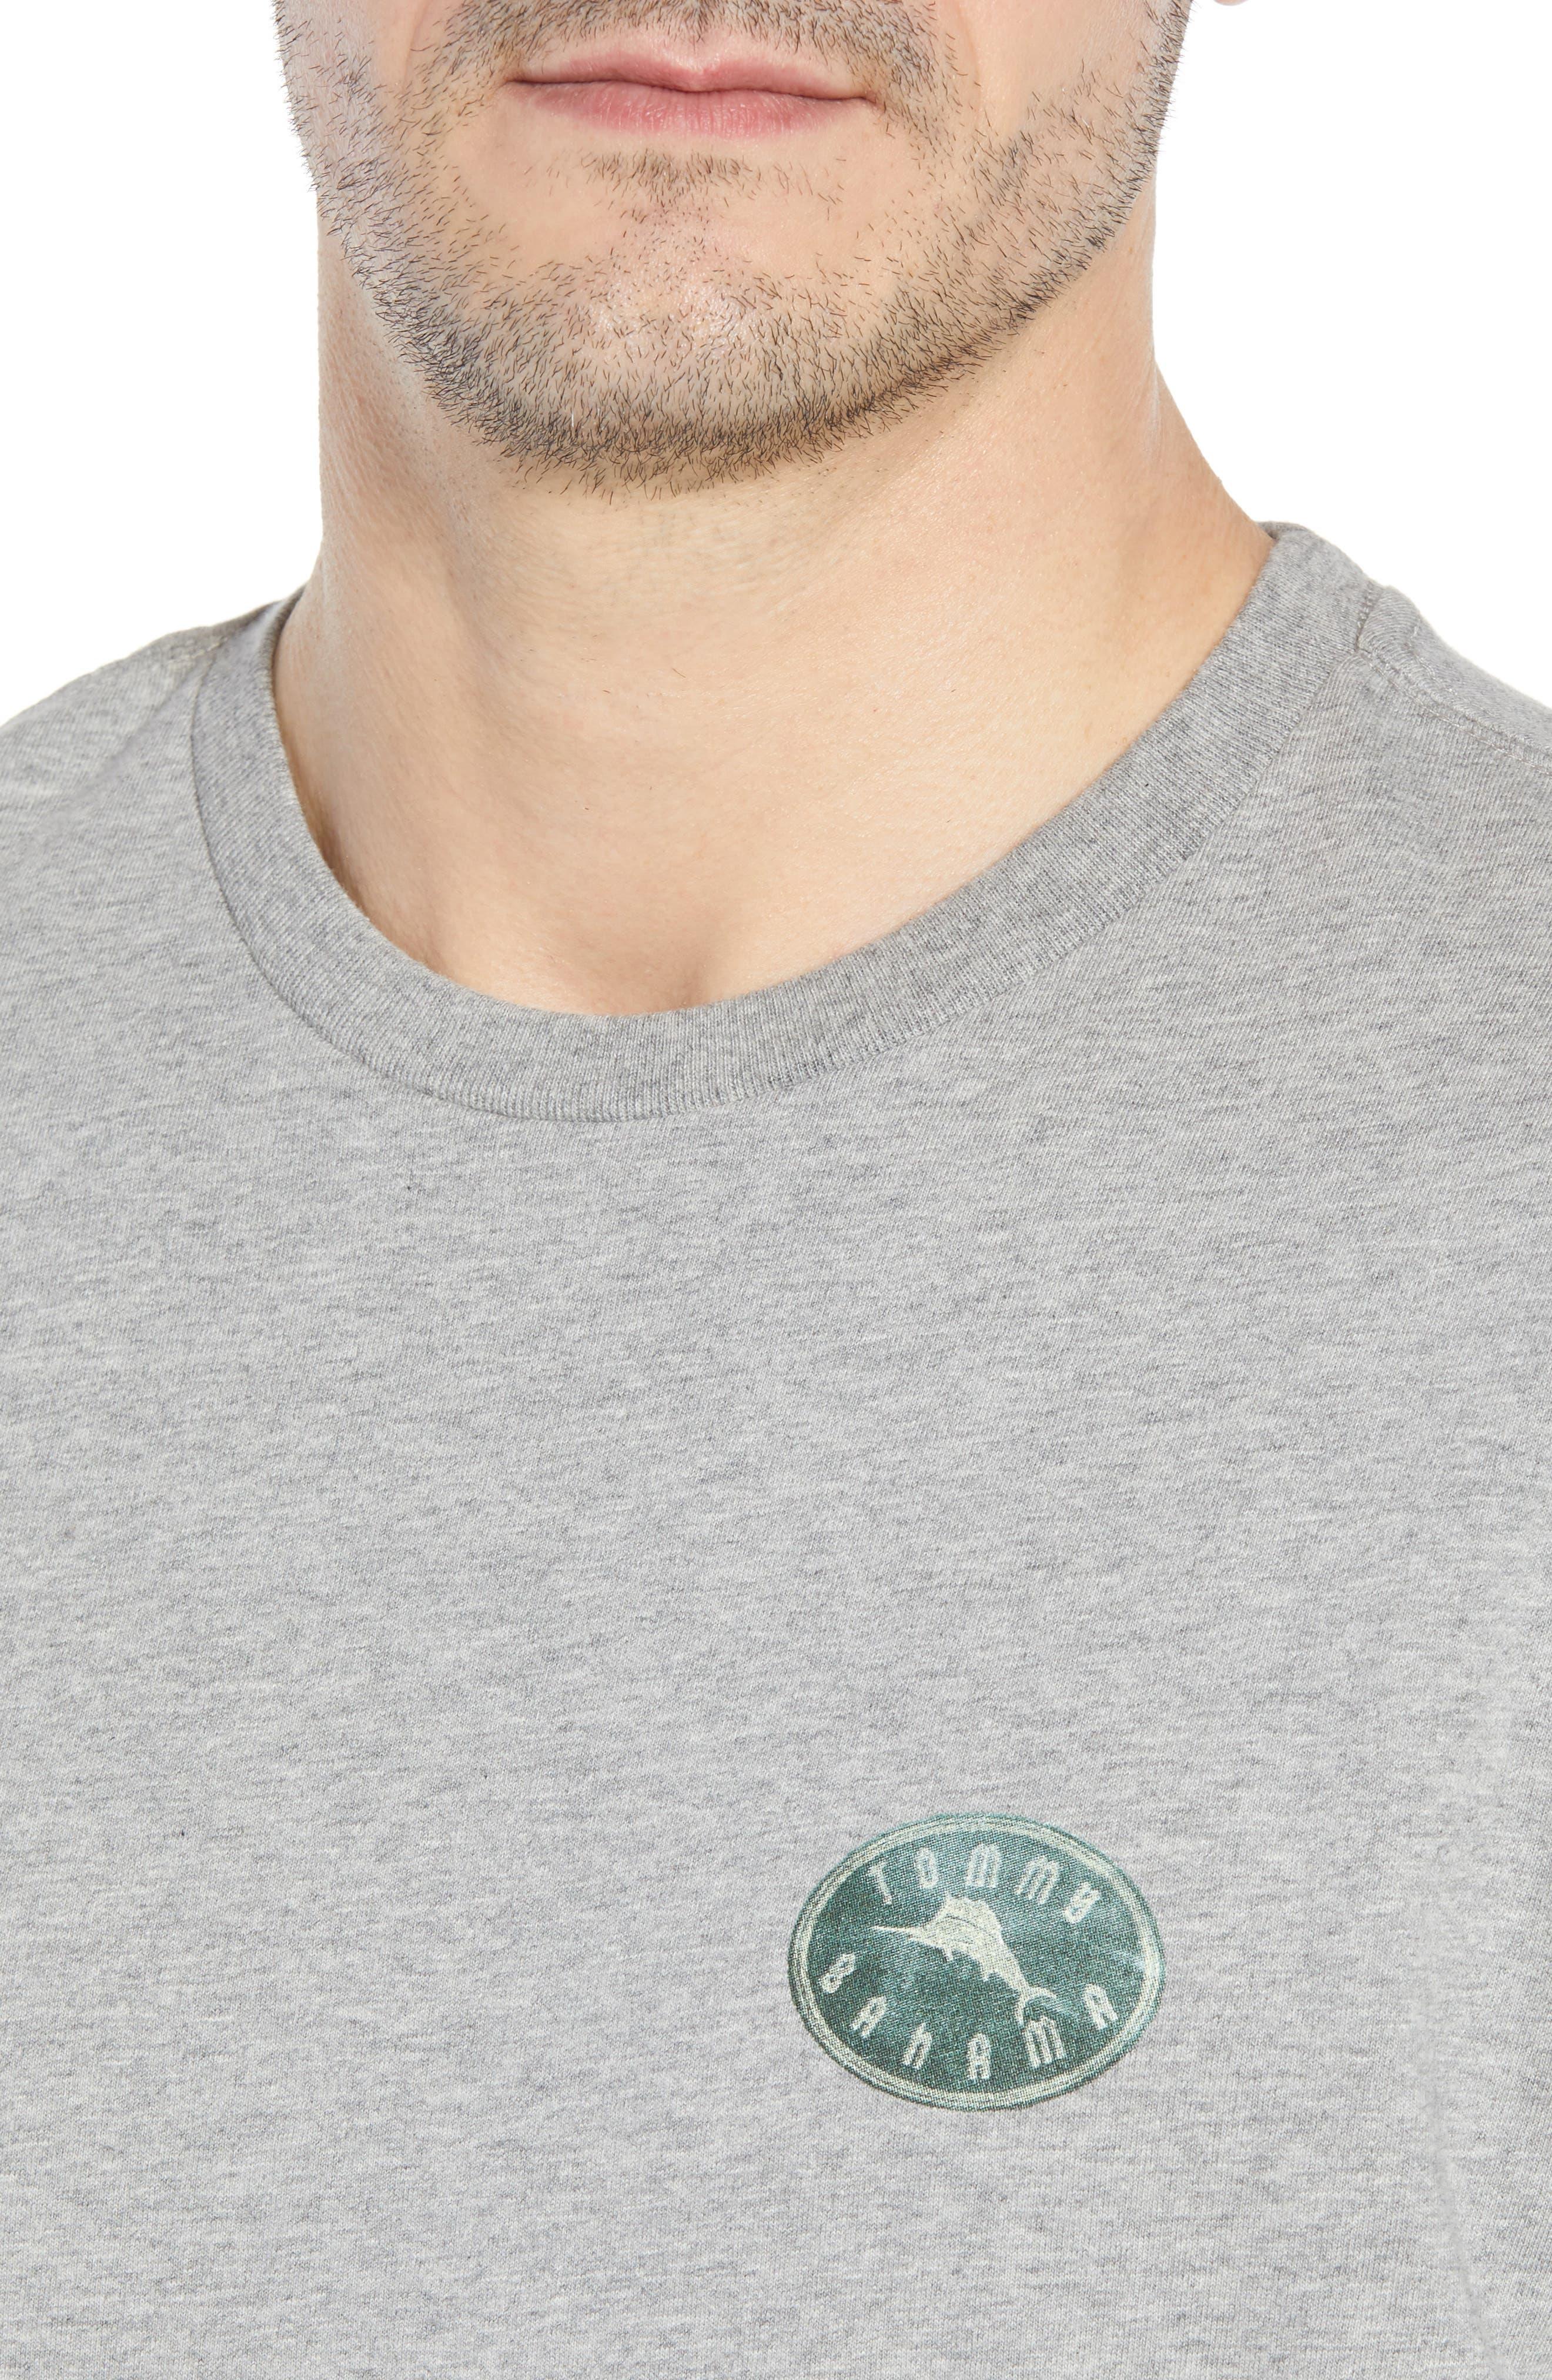 Chalk & Roll T-Shirt,                             Alternate thumbnail 8, color,